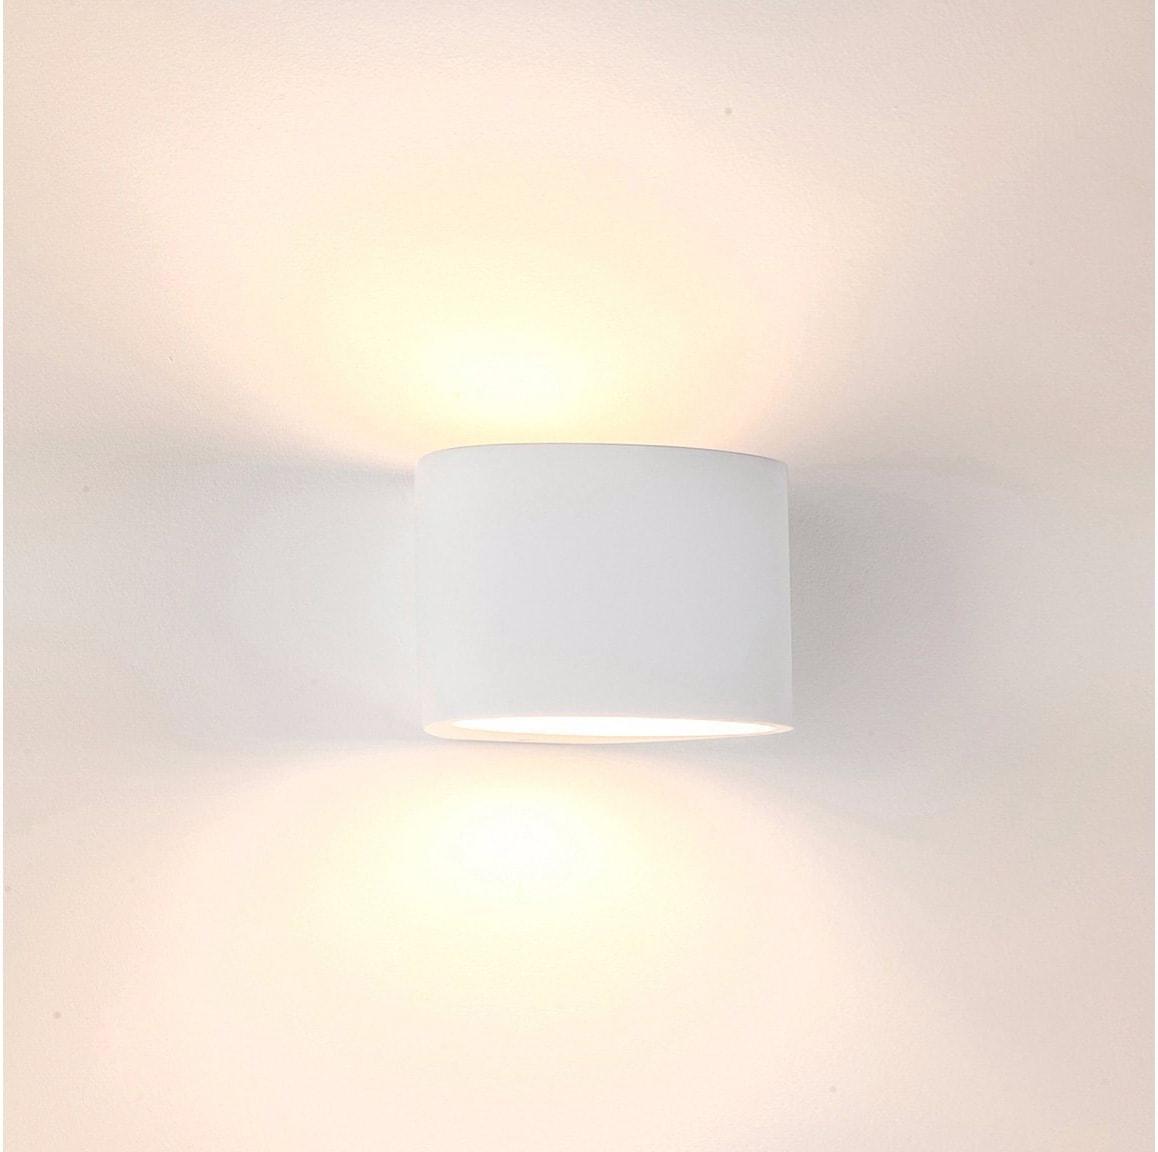 Havit Lighting LED Wandleuchte ARC, G9, 1 St.